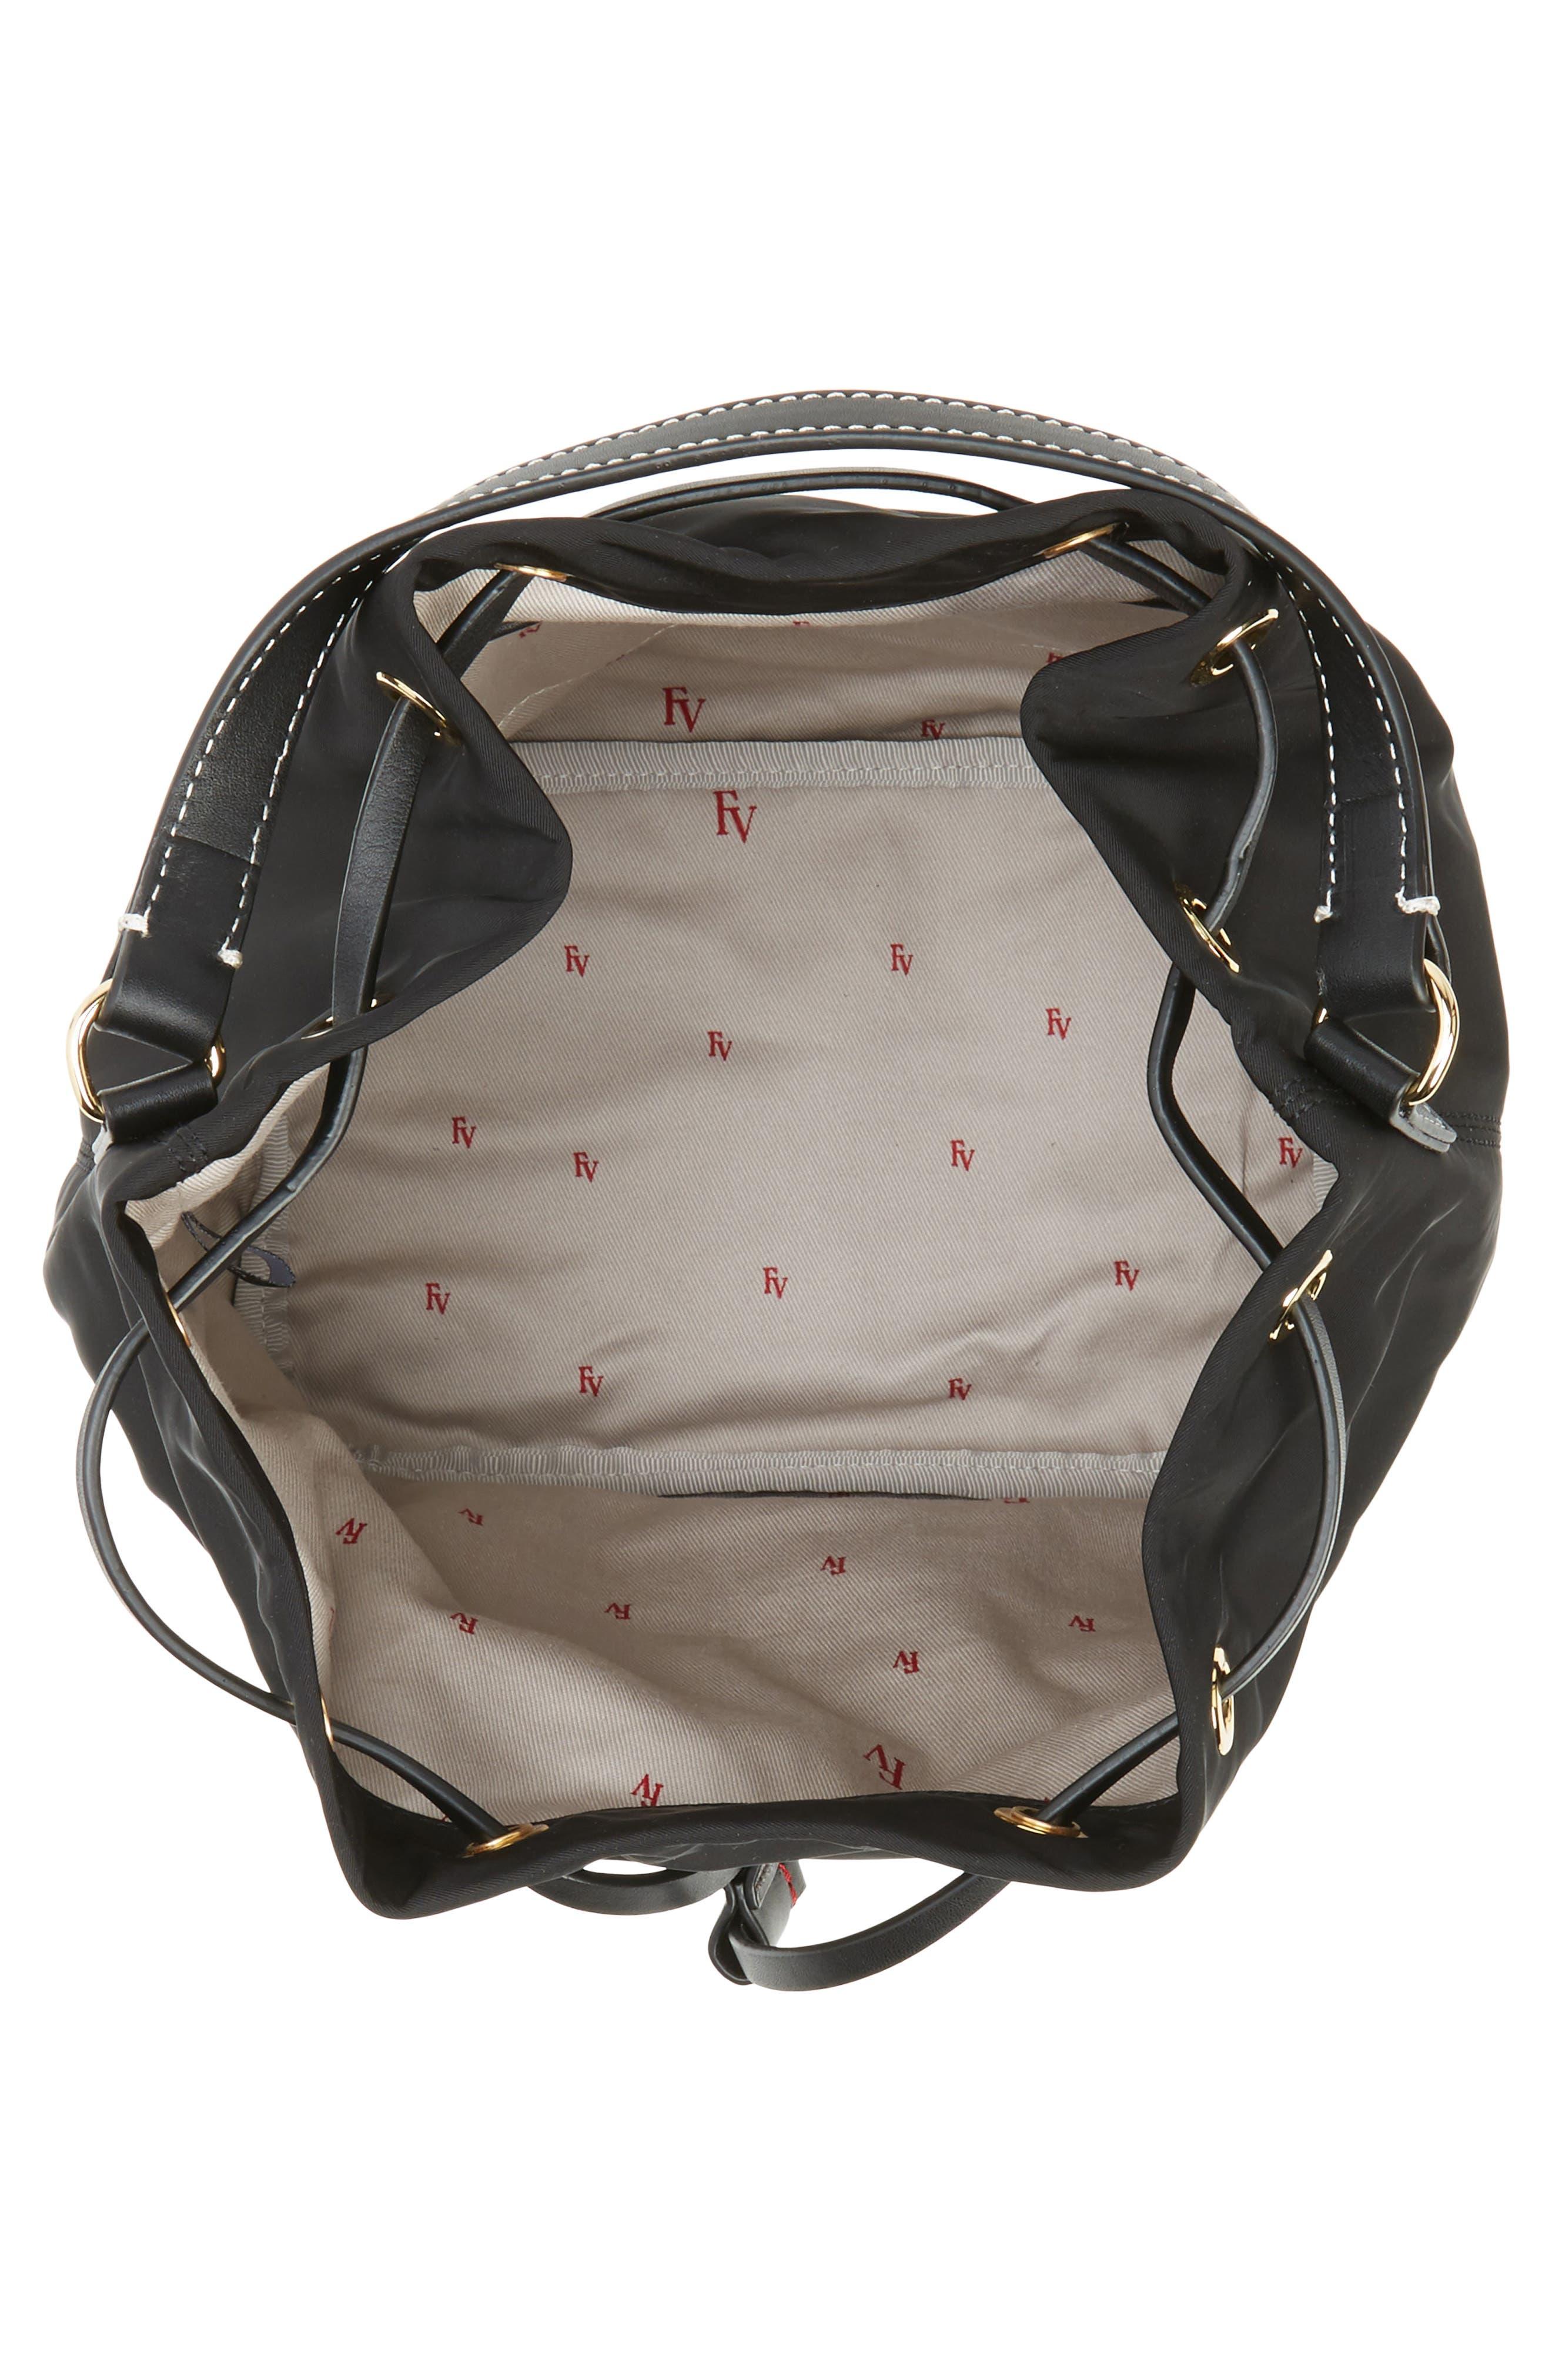 Medium Ann Nylon Bucket Bag,                             Alternate thumbnail 7, color,